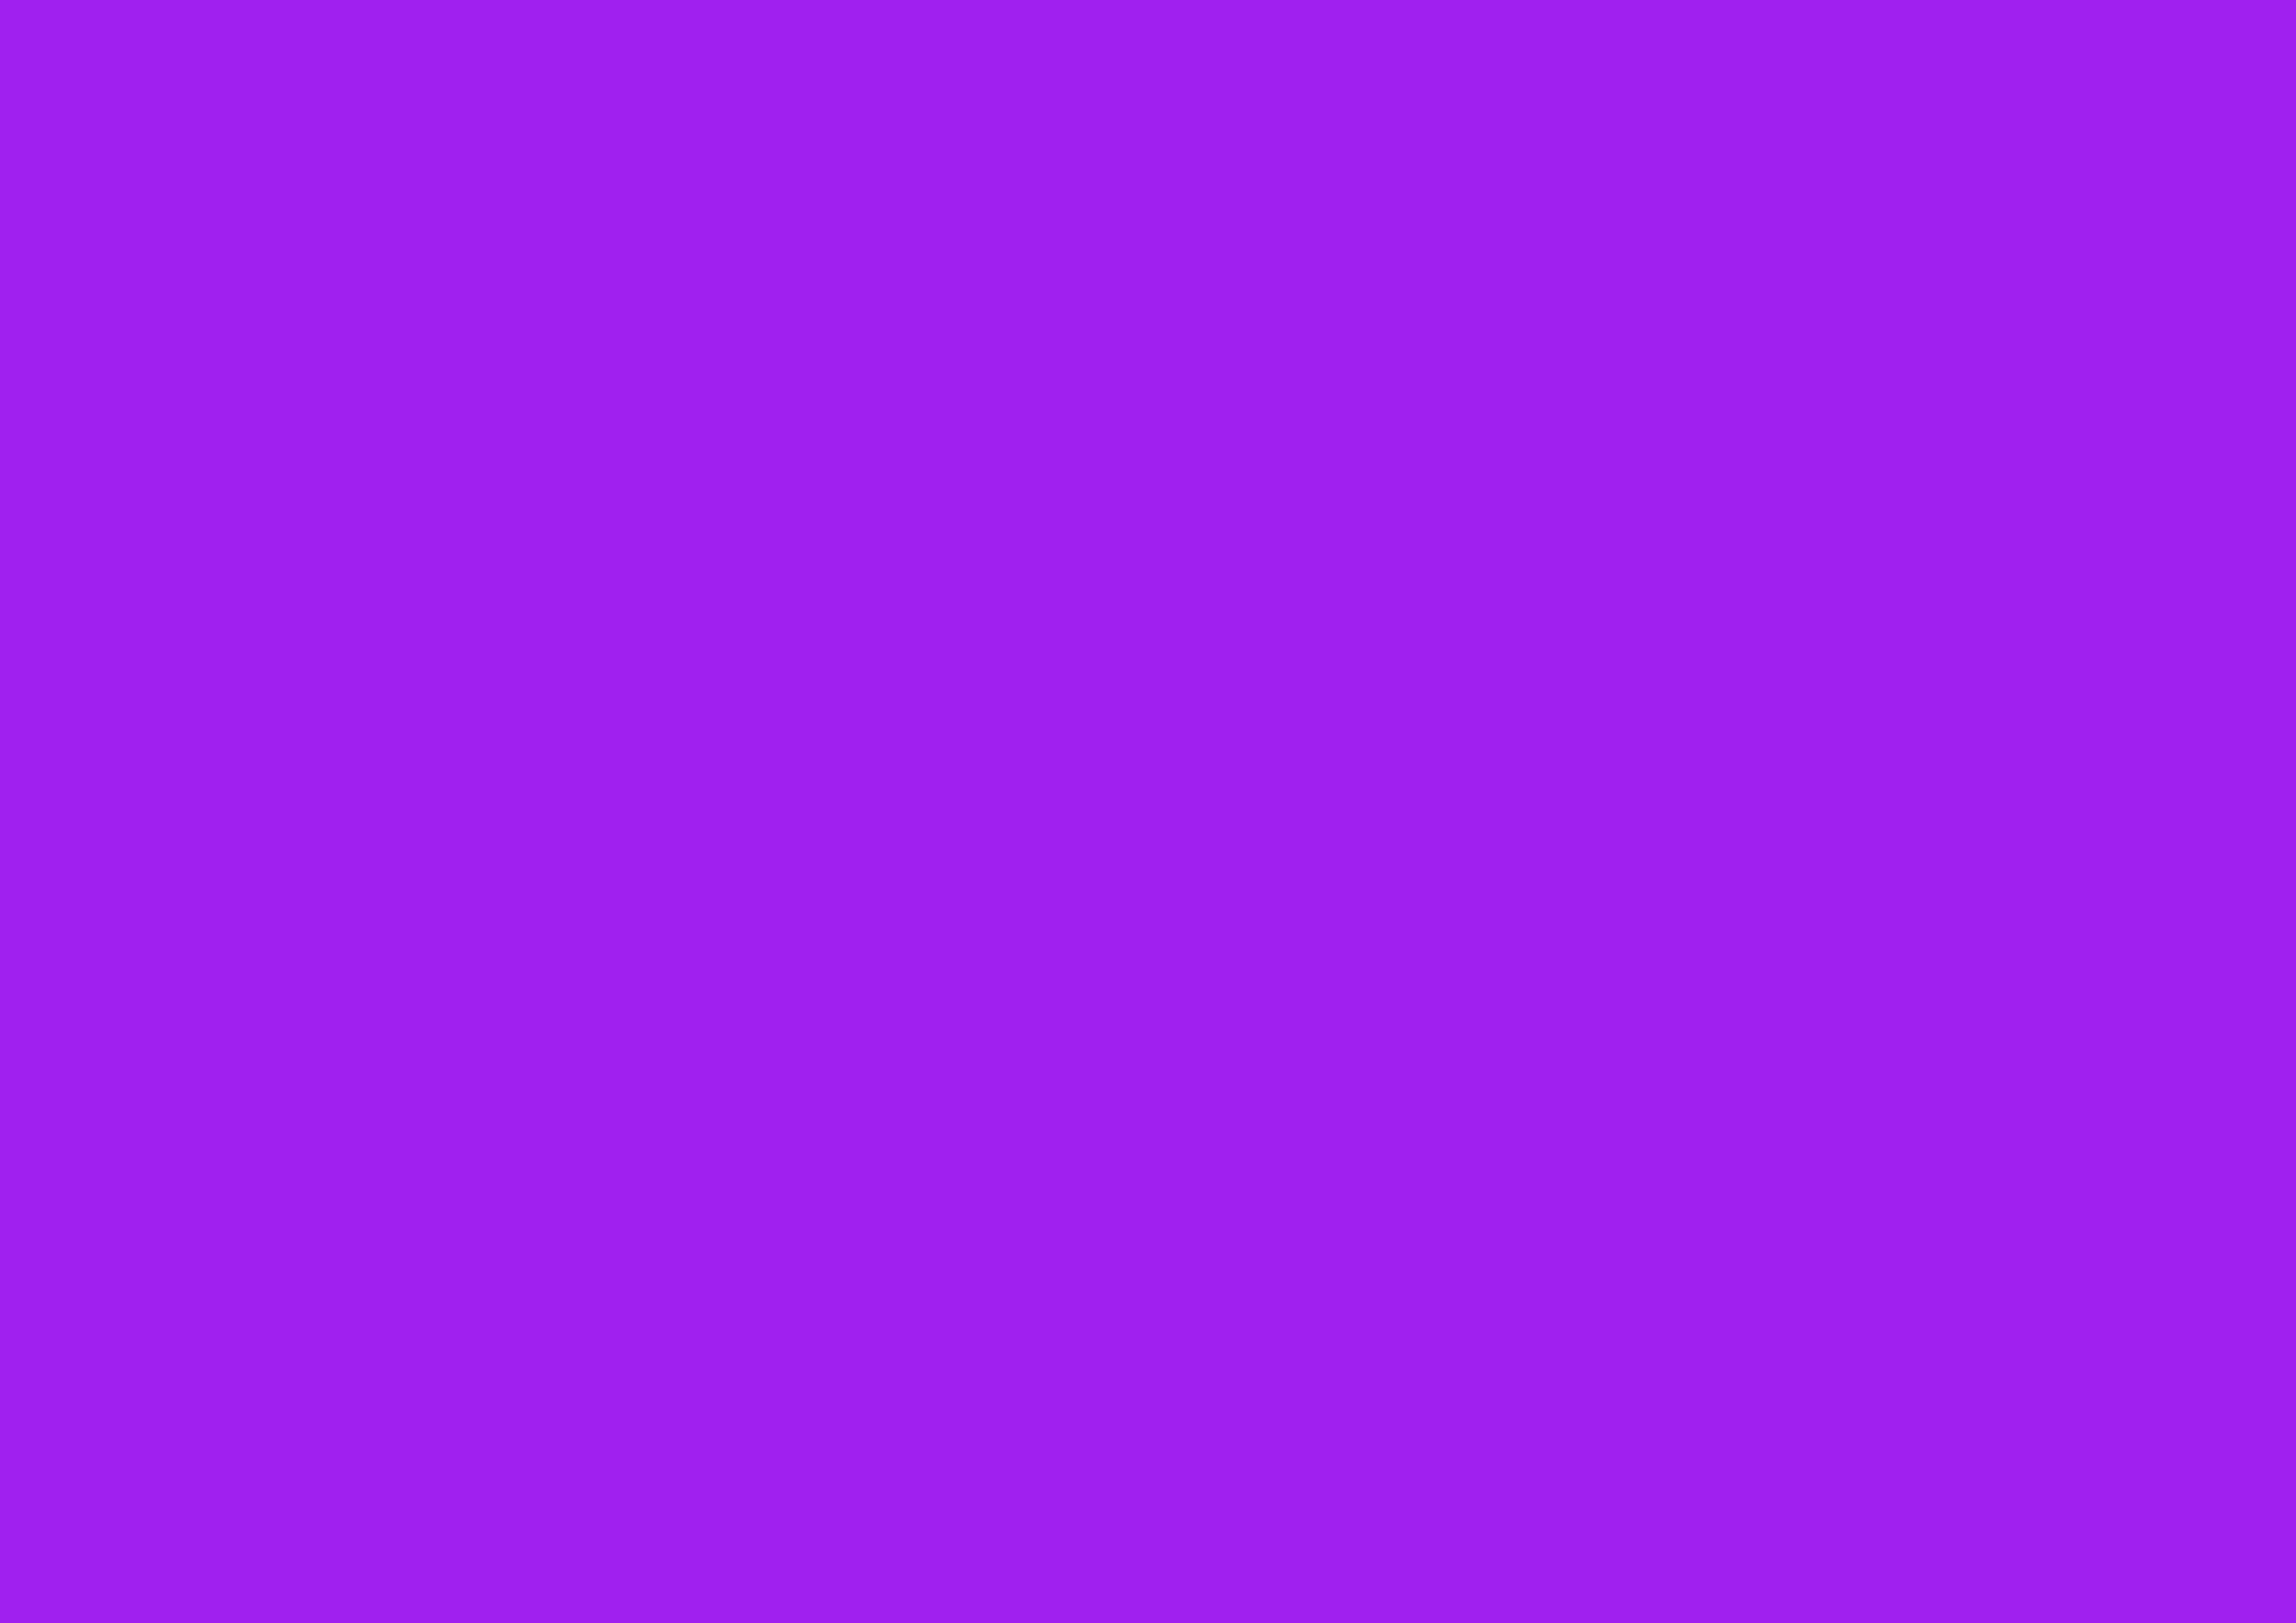 3508x2480 Purple X11 Gui Solid Color Background